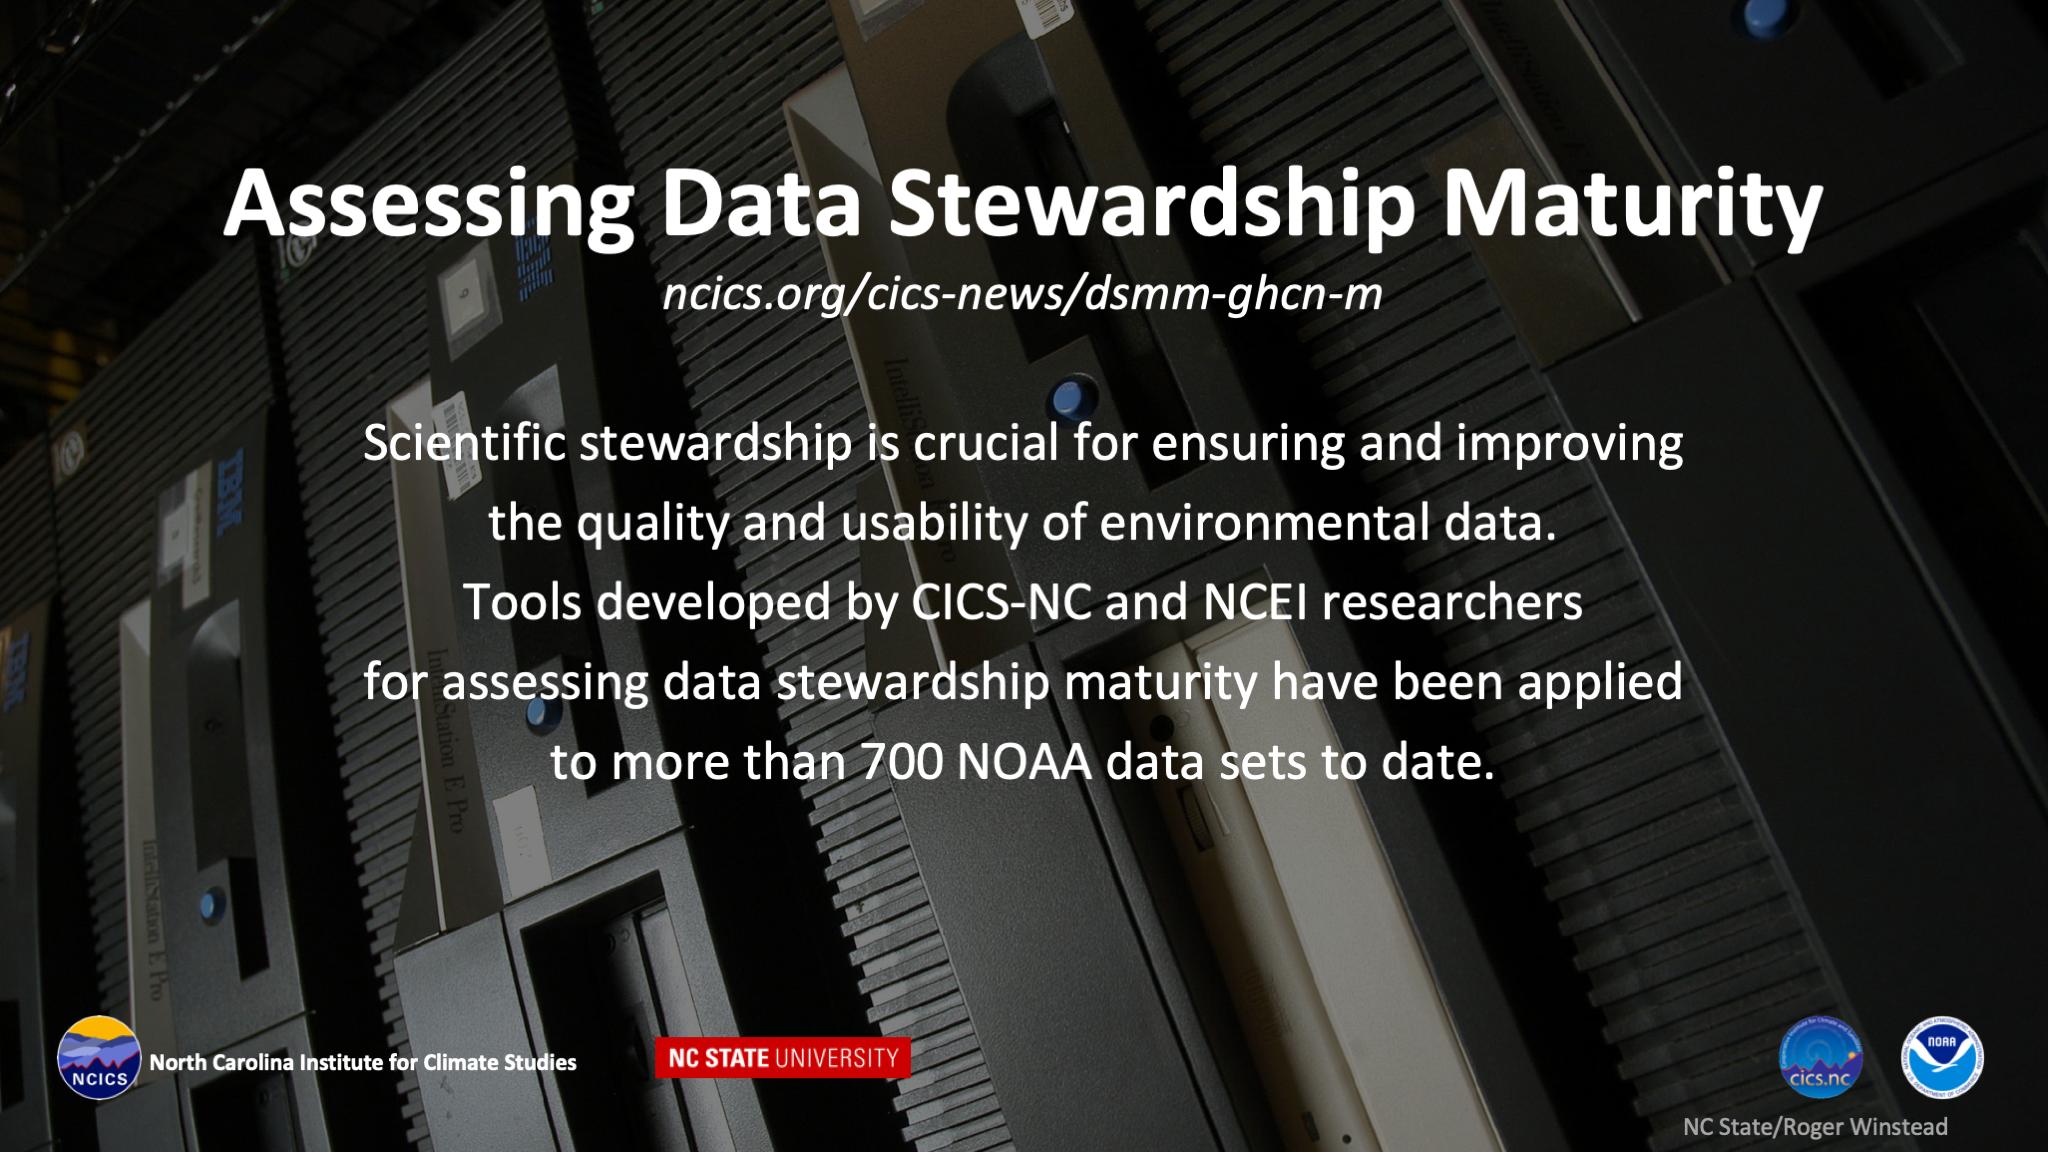 Assessing Data Stewardship Maturity